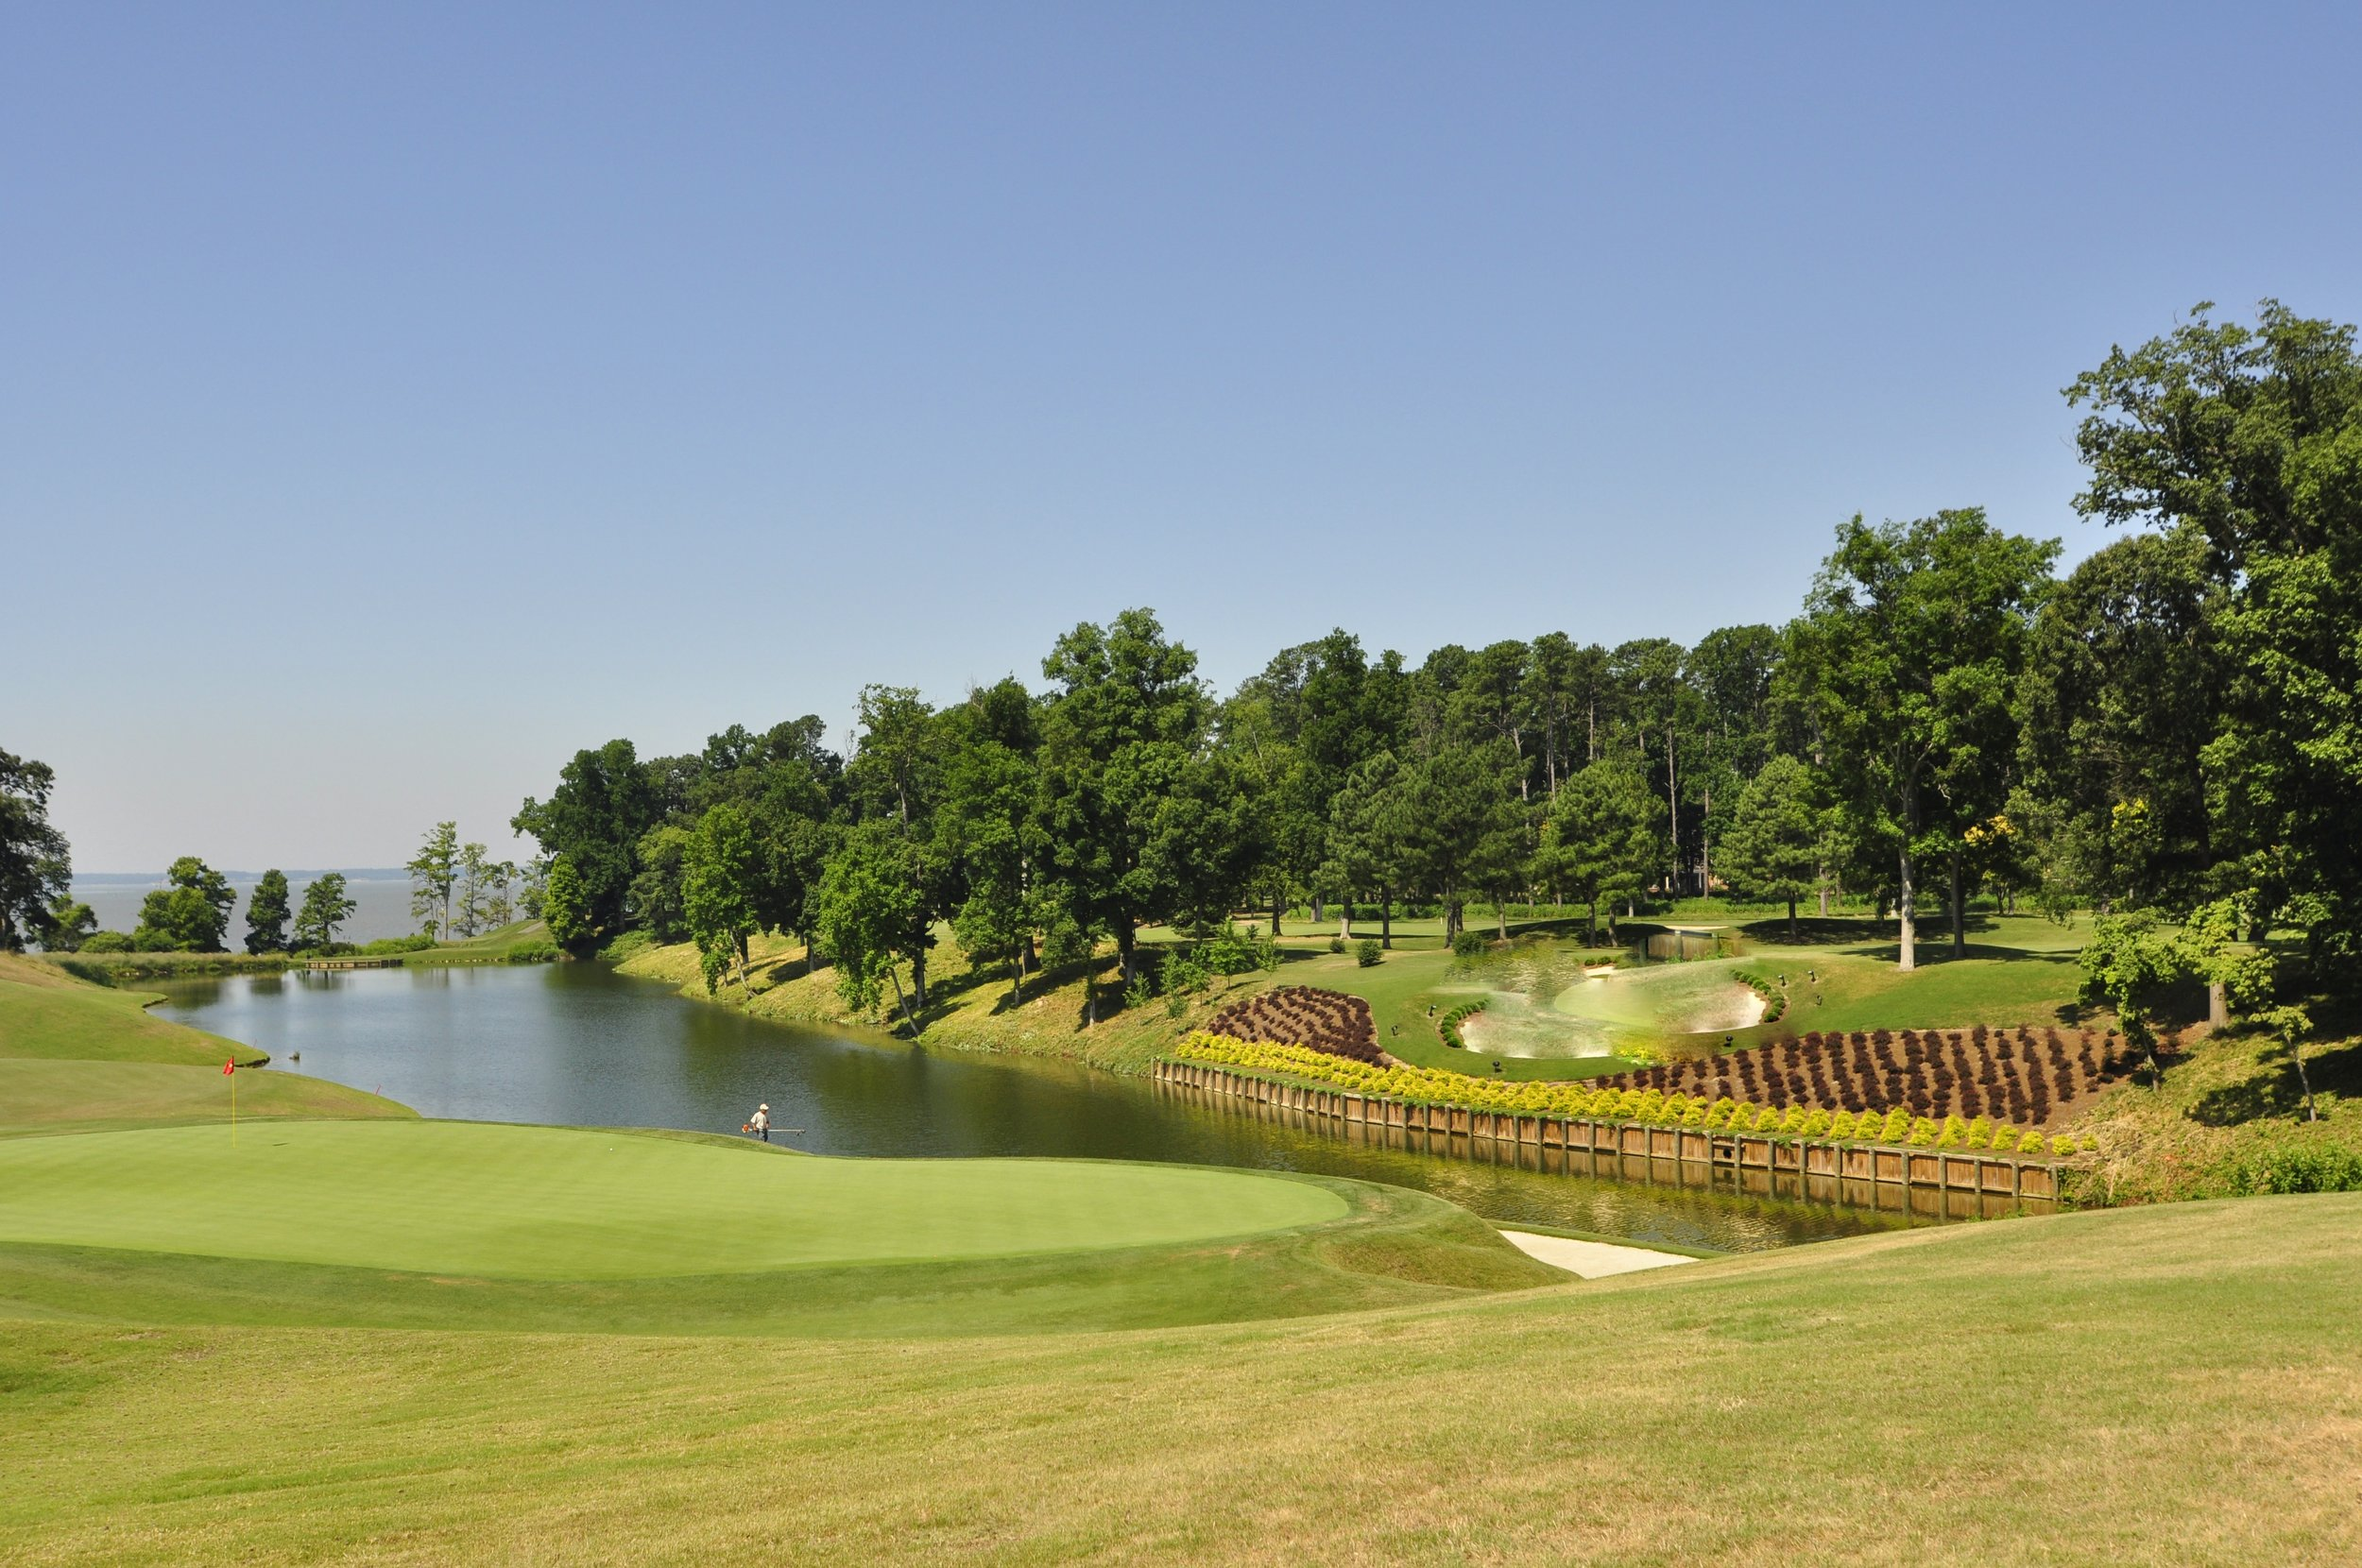 KM logo on golf course - Copy (2).jpg